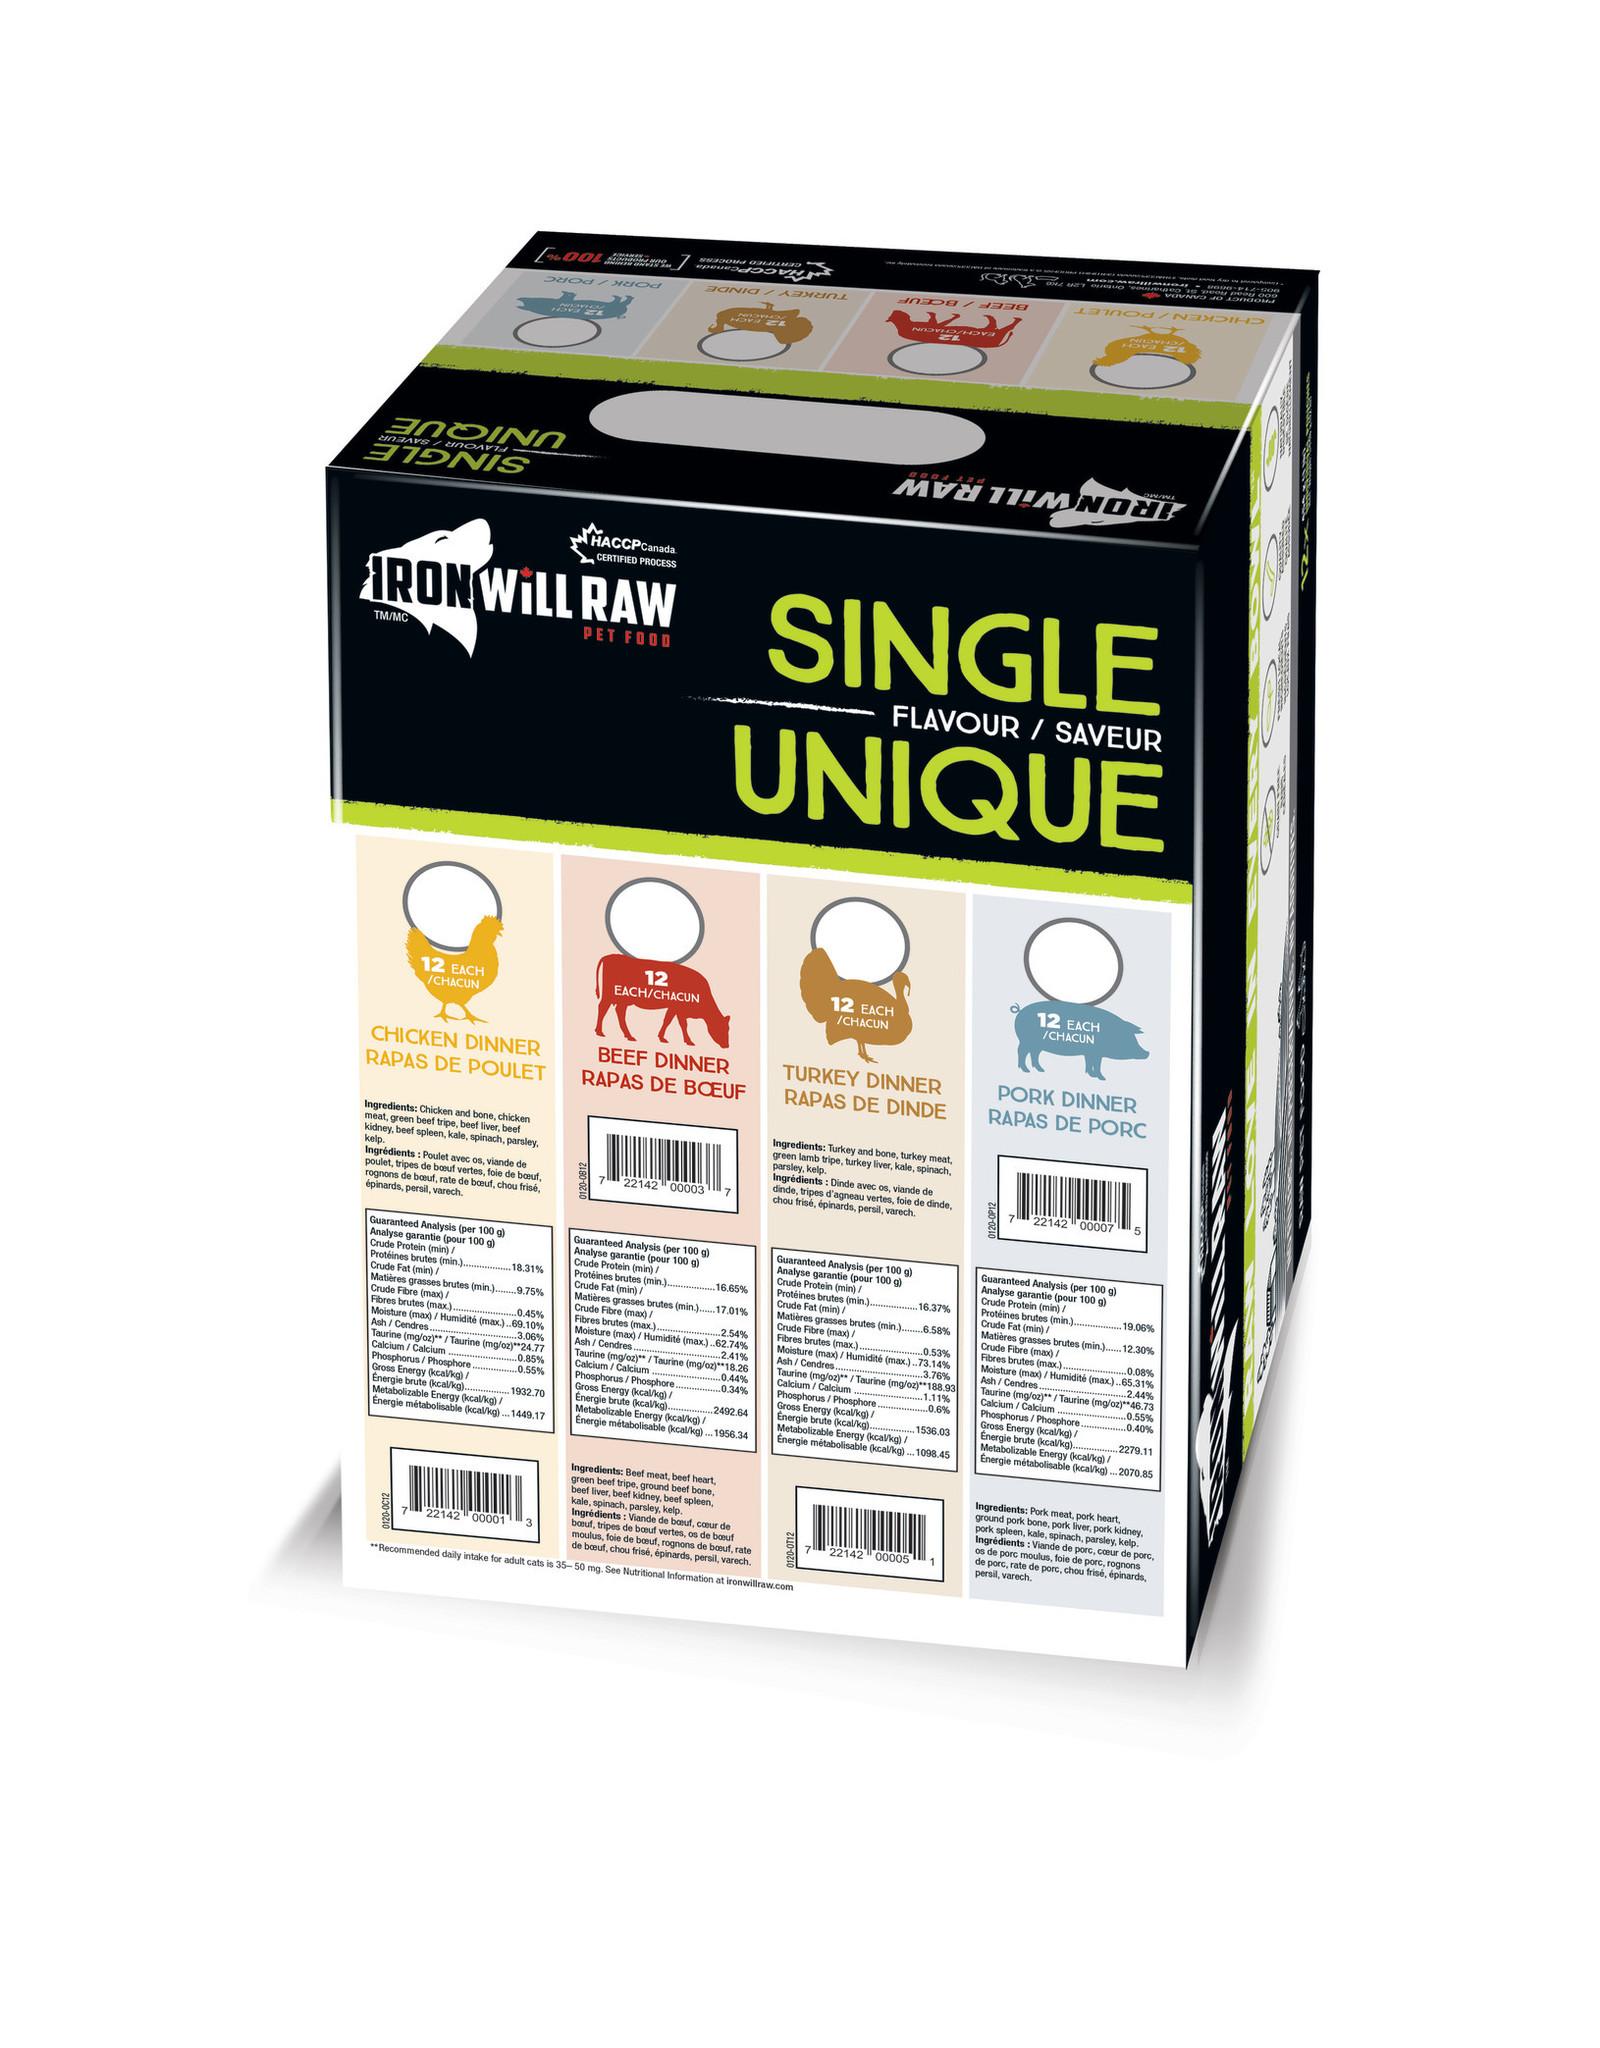 Iron Will Raw Iron Will Original Beef Dinner 12lb Box